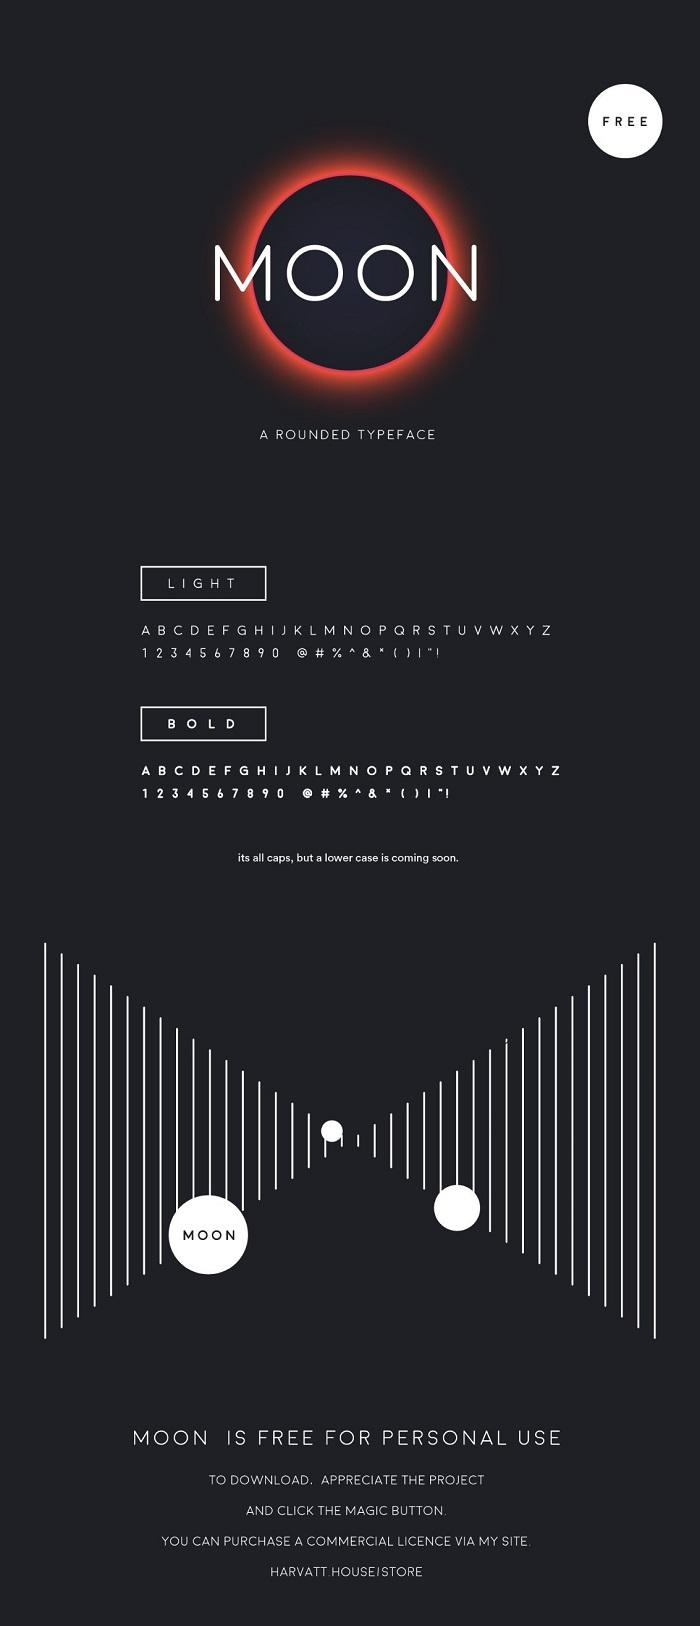 Moon Free Font on Behance - Post